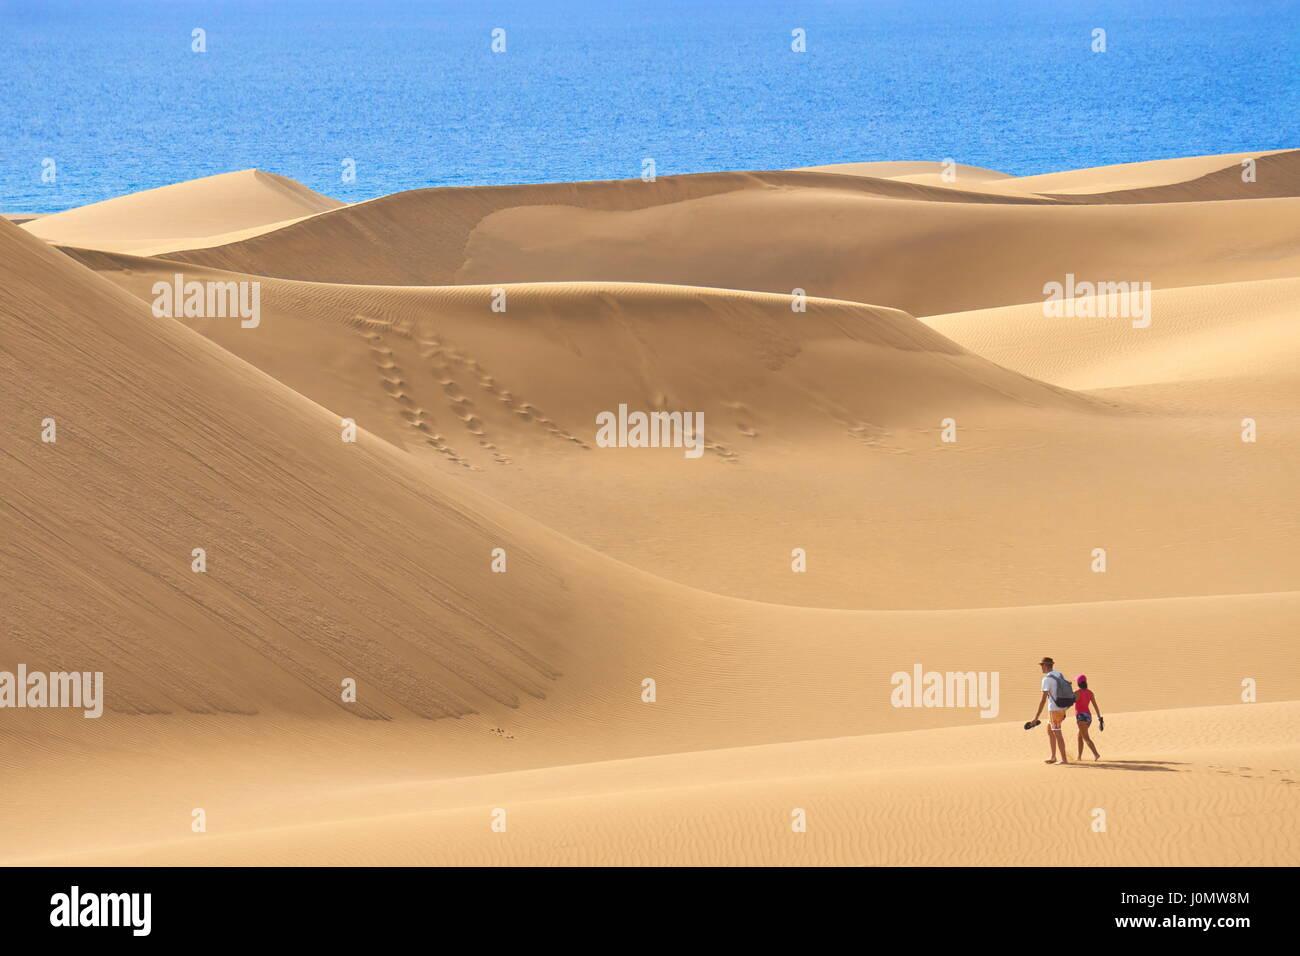 Touristen am Maspalomas Sand Dunes National Park, Gran Canaria, Spanien Stockbild